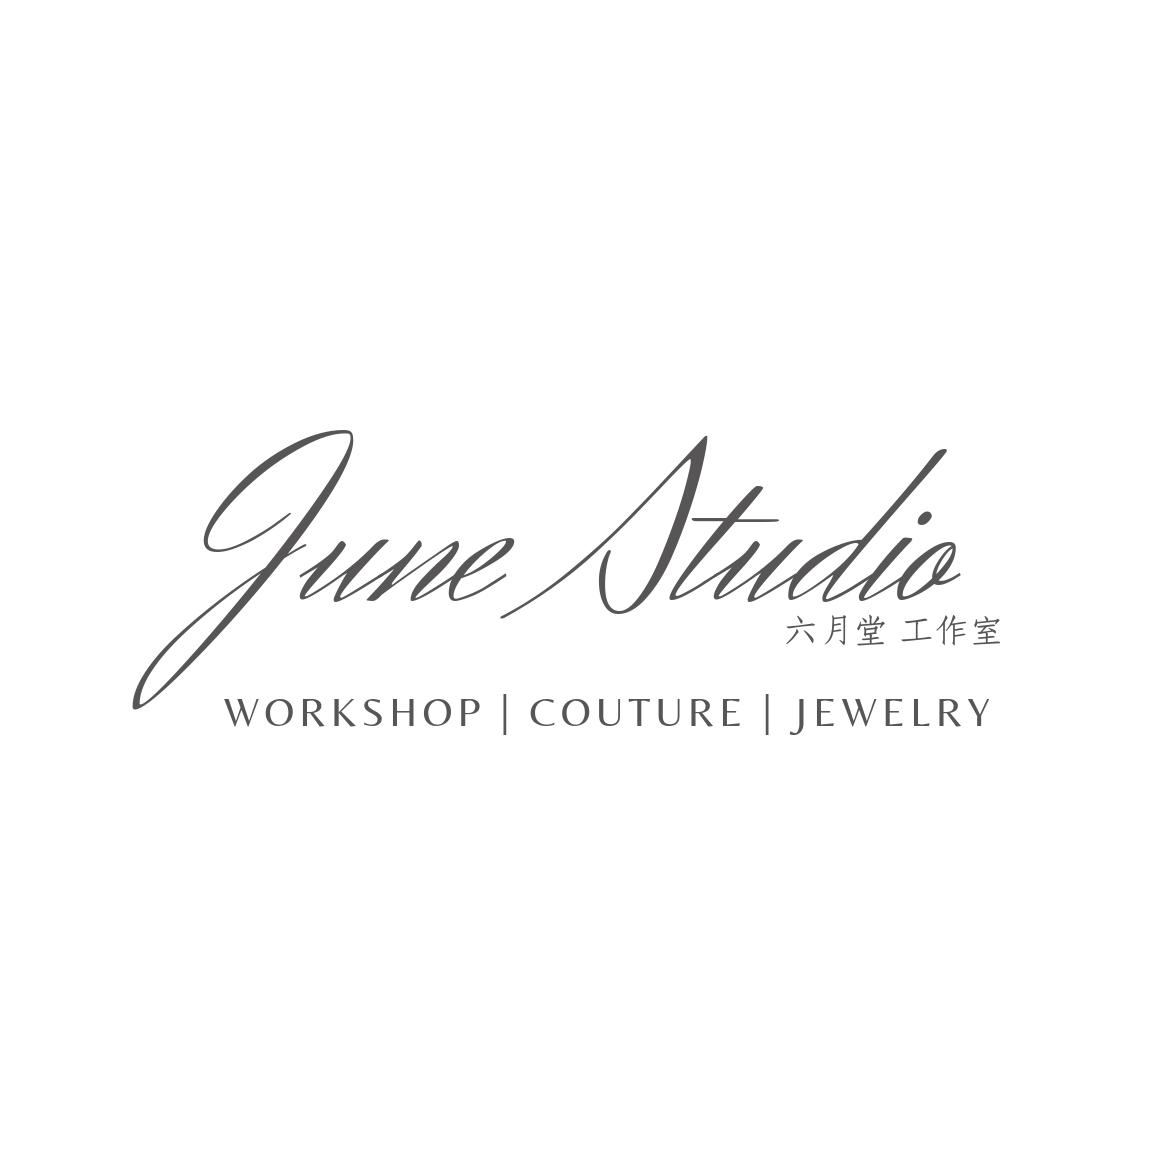 June Stuido